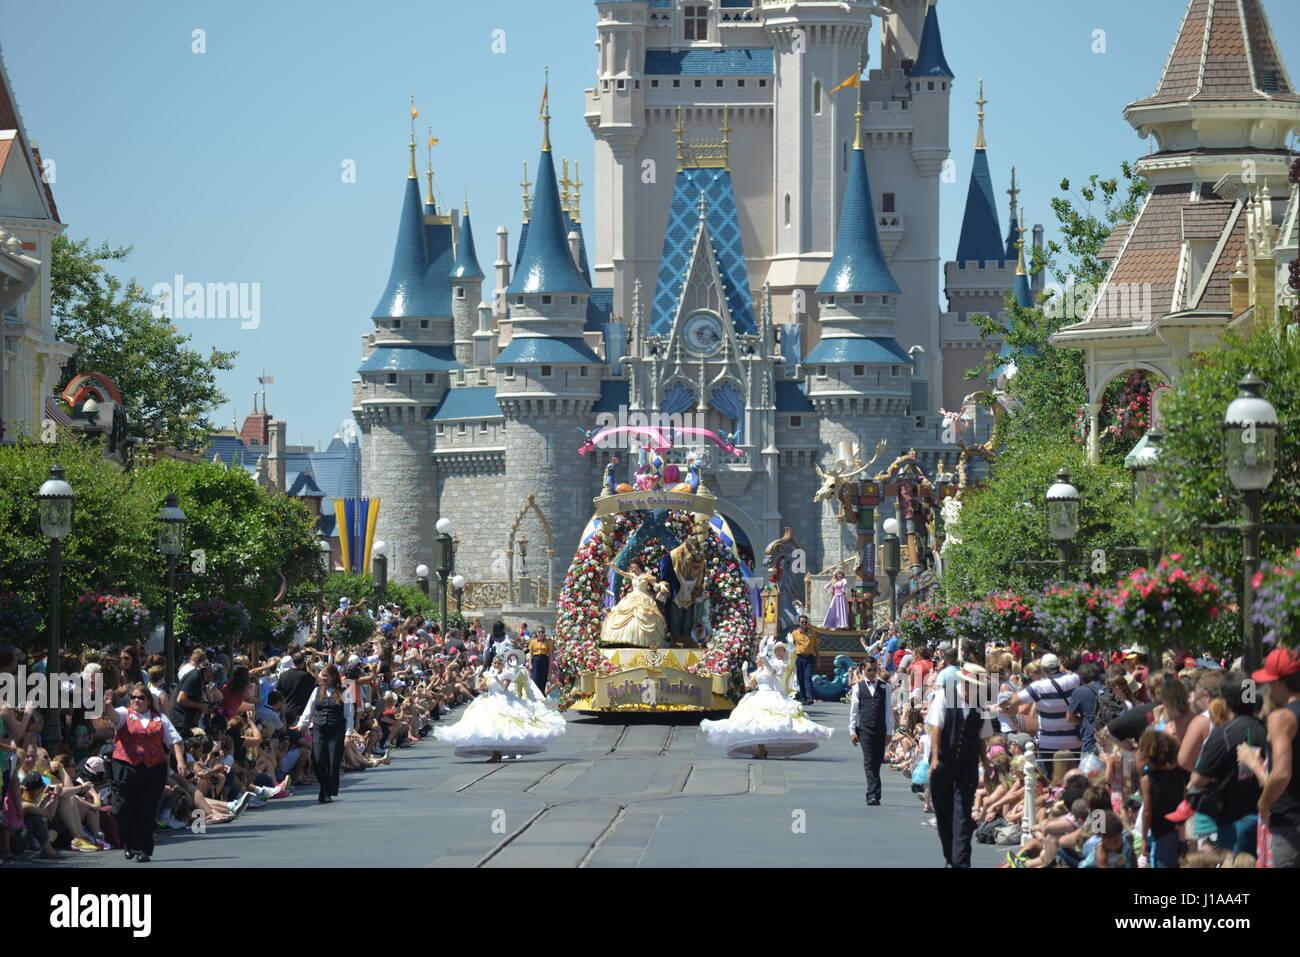 Walt Disney World Parade   Orlando Florida USA - Stock Image